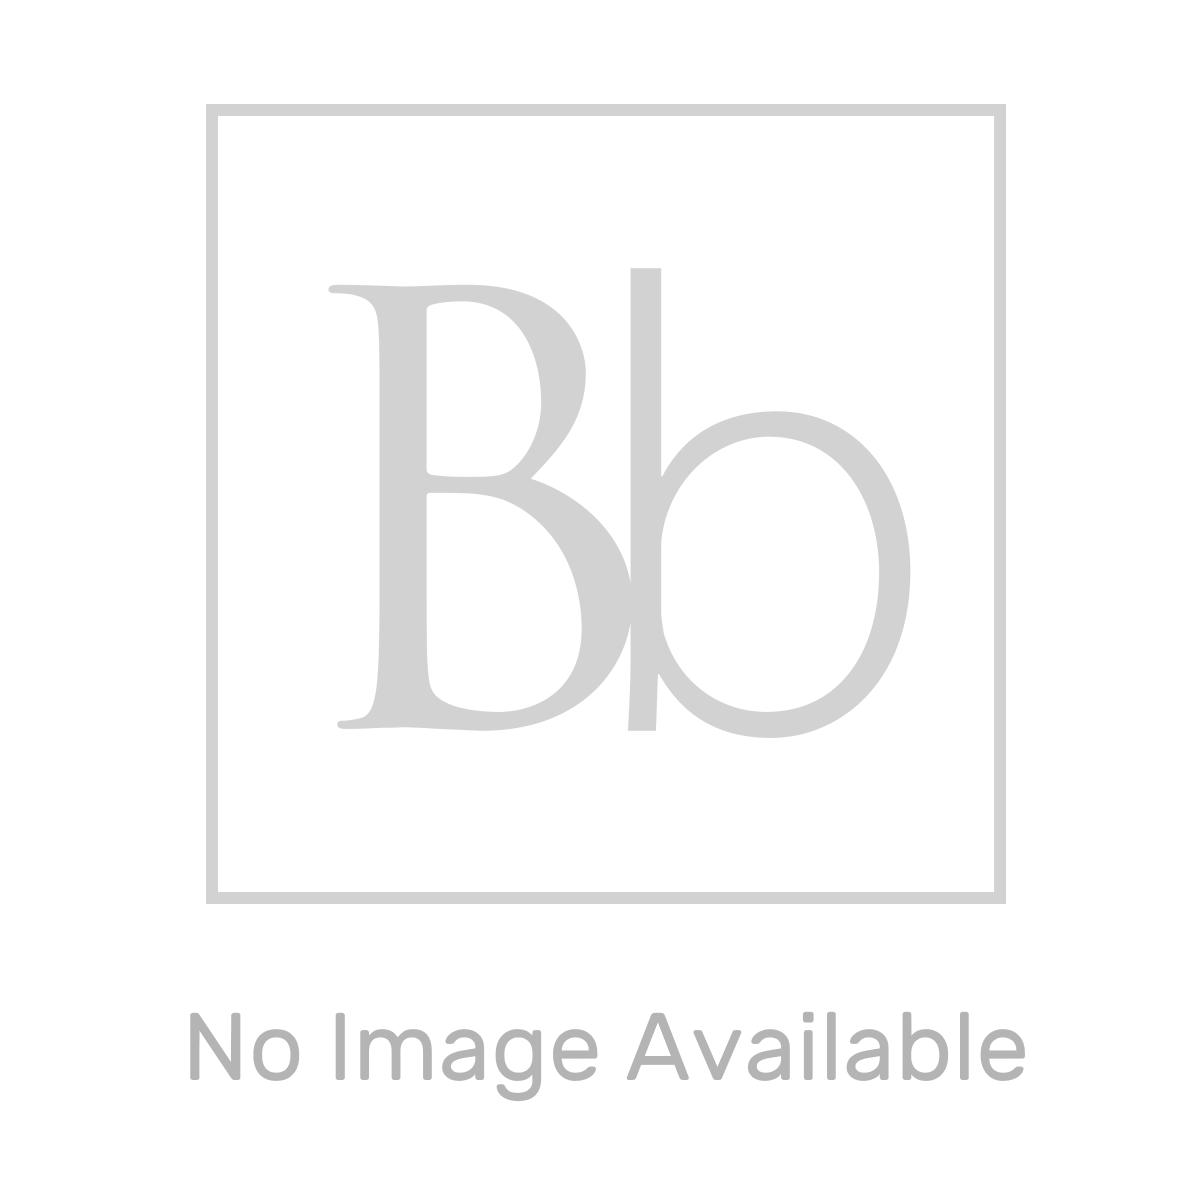 Tavistock Millennium White Wood Veneer Toilet Seat